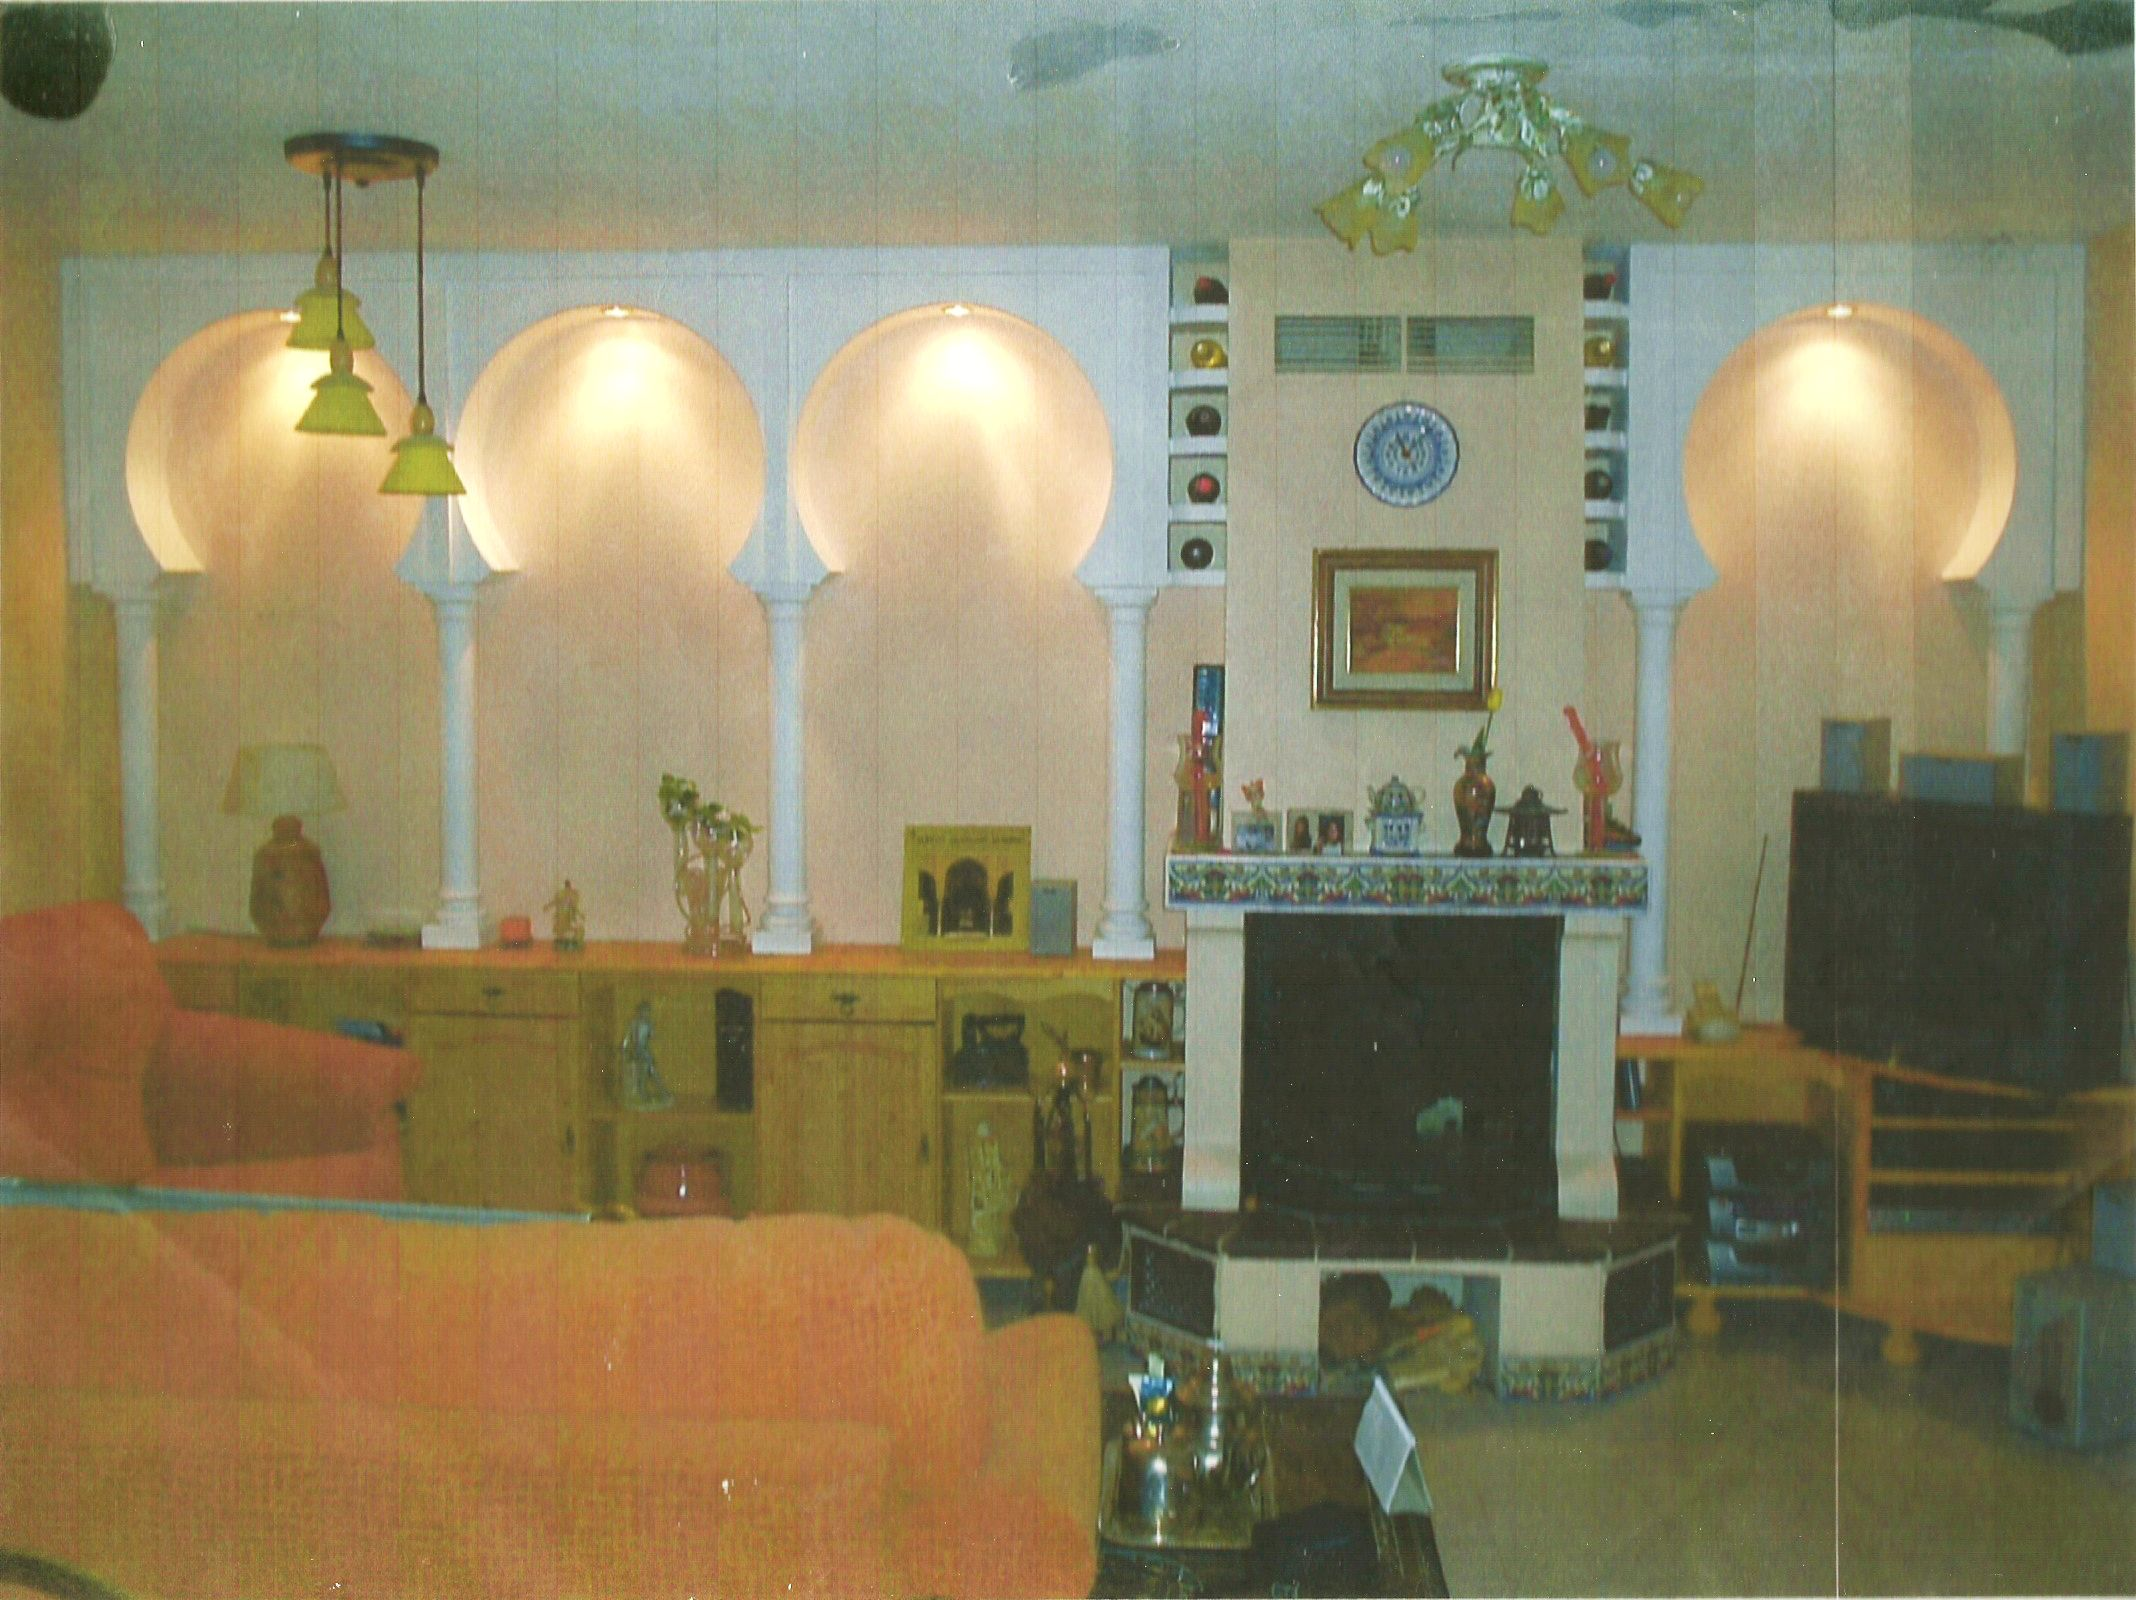 arcos de estilo arabe